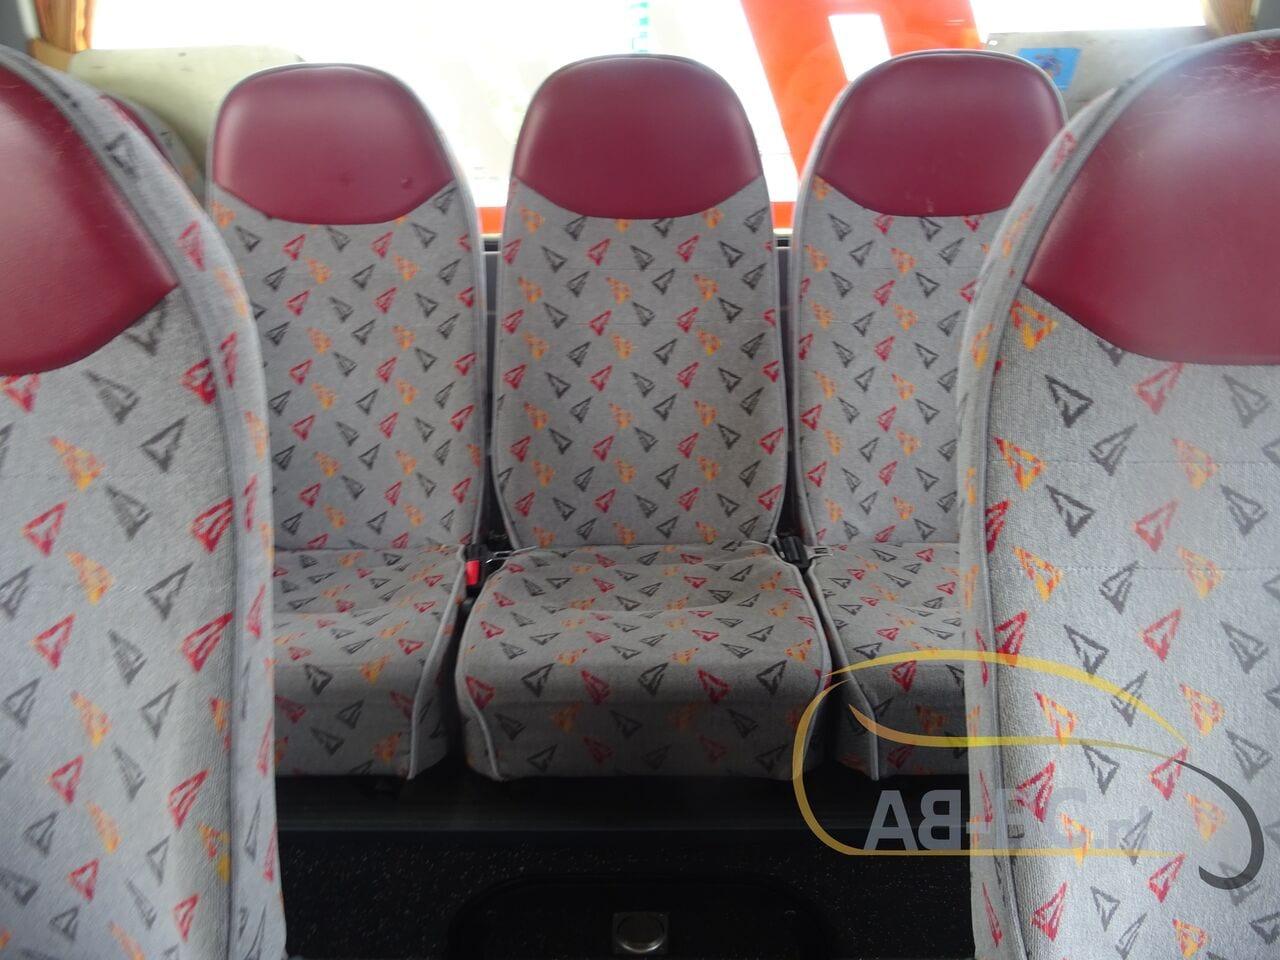 coach-busTEMSA-Safari-RD-DAF-Motor-53-Seats-Euro-5---1623932572922188380_big_4713bf9e2936ae98a5df9635577c33cb--21061715155620919600